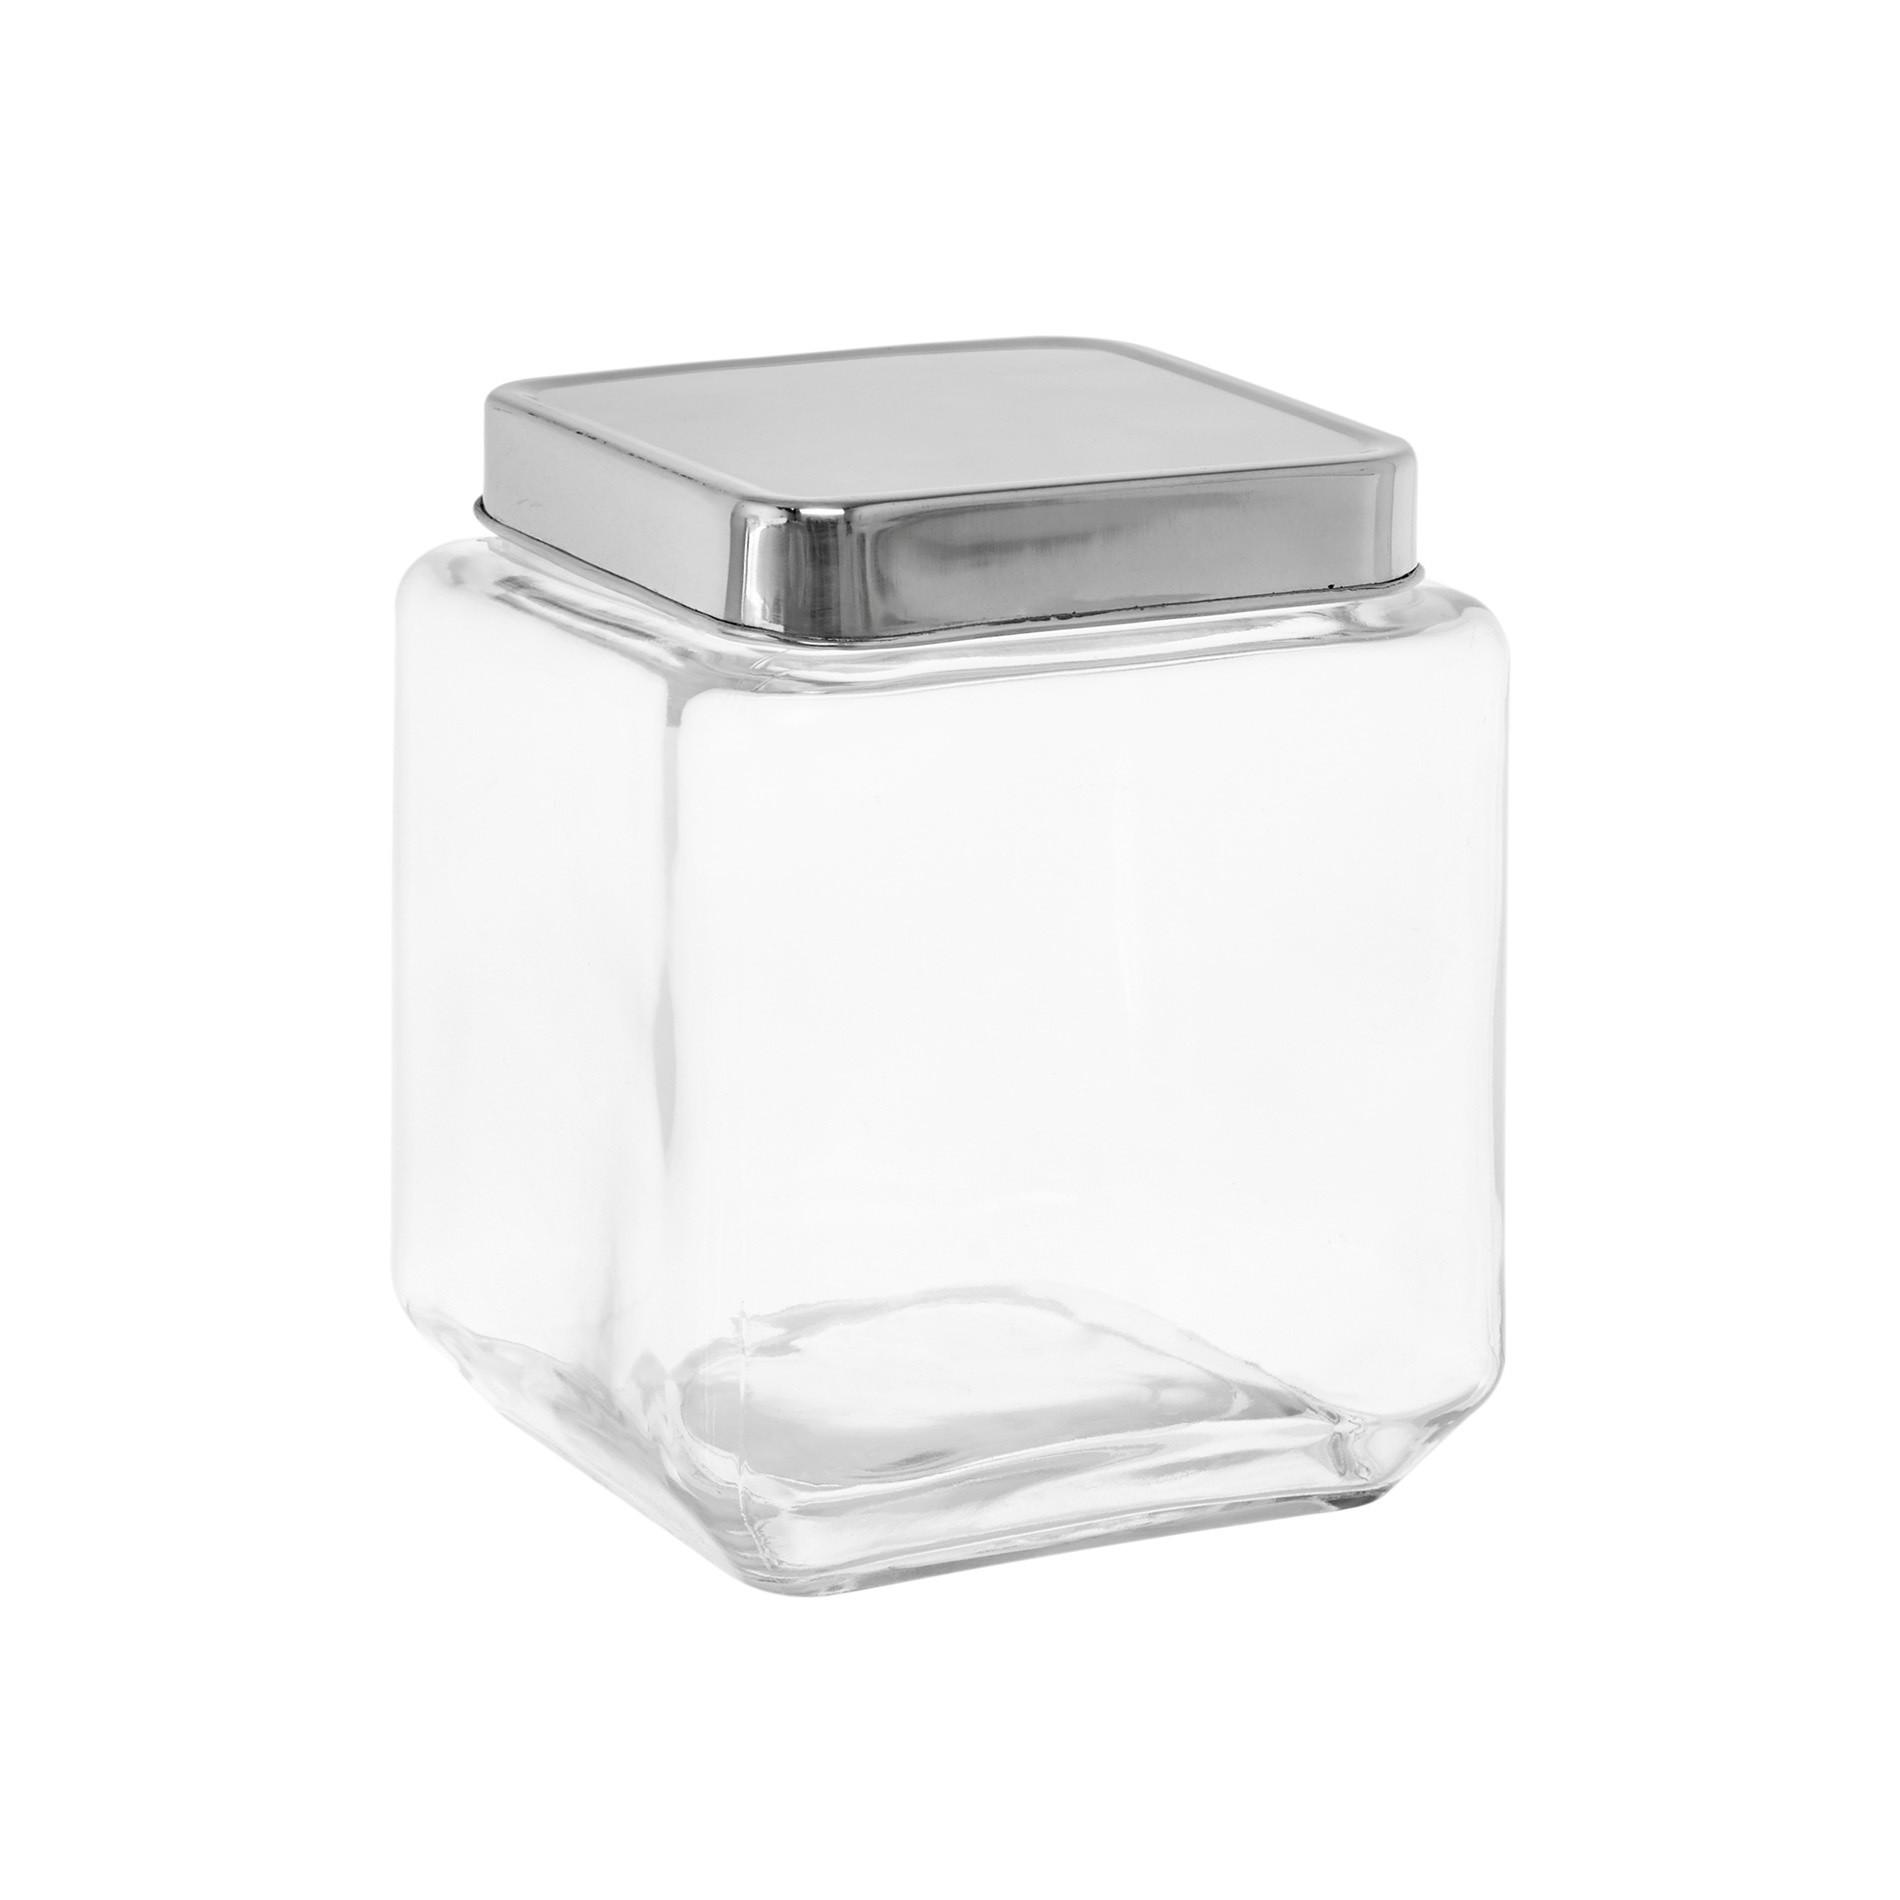 Barattolo vetro tappo inox 1.2Lt, Trasparente, large image number 0